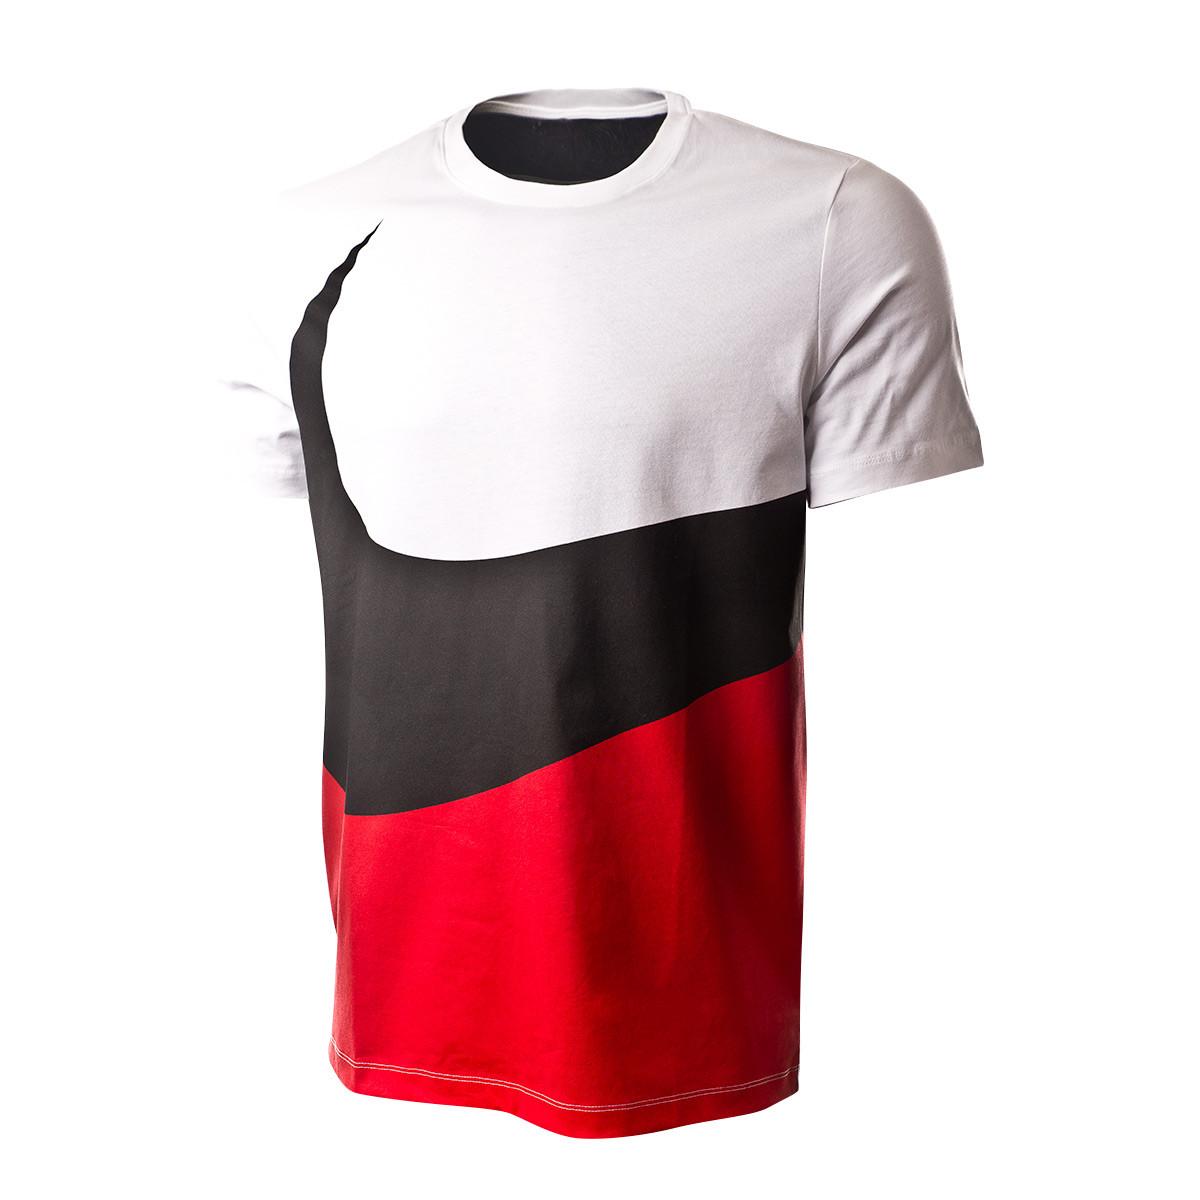 Maillot Nike Sportswear Swoosh 2019